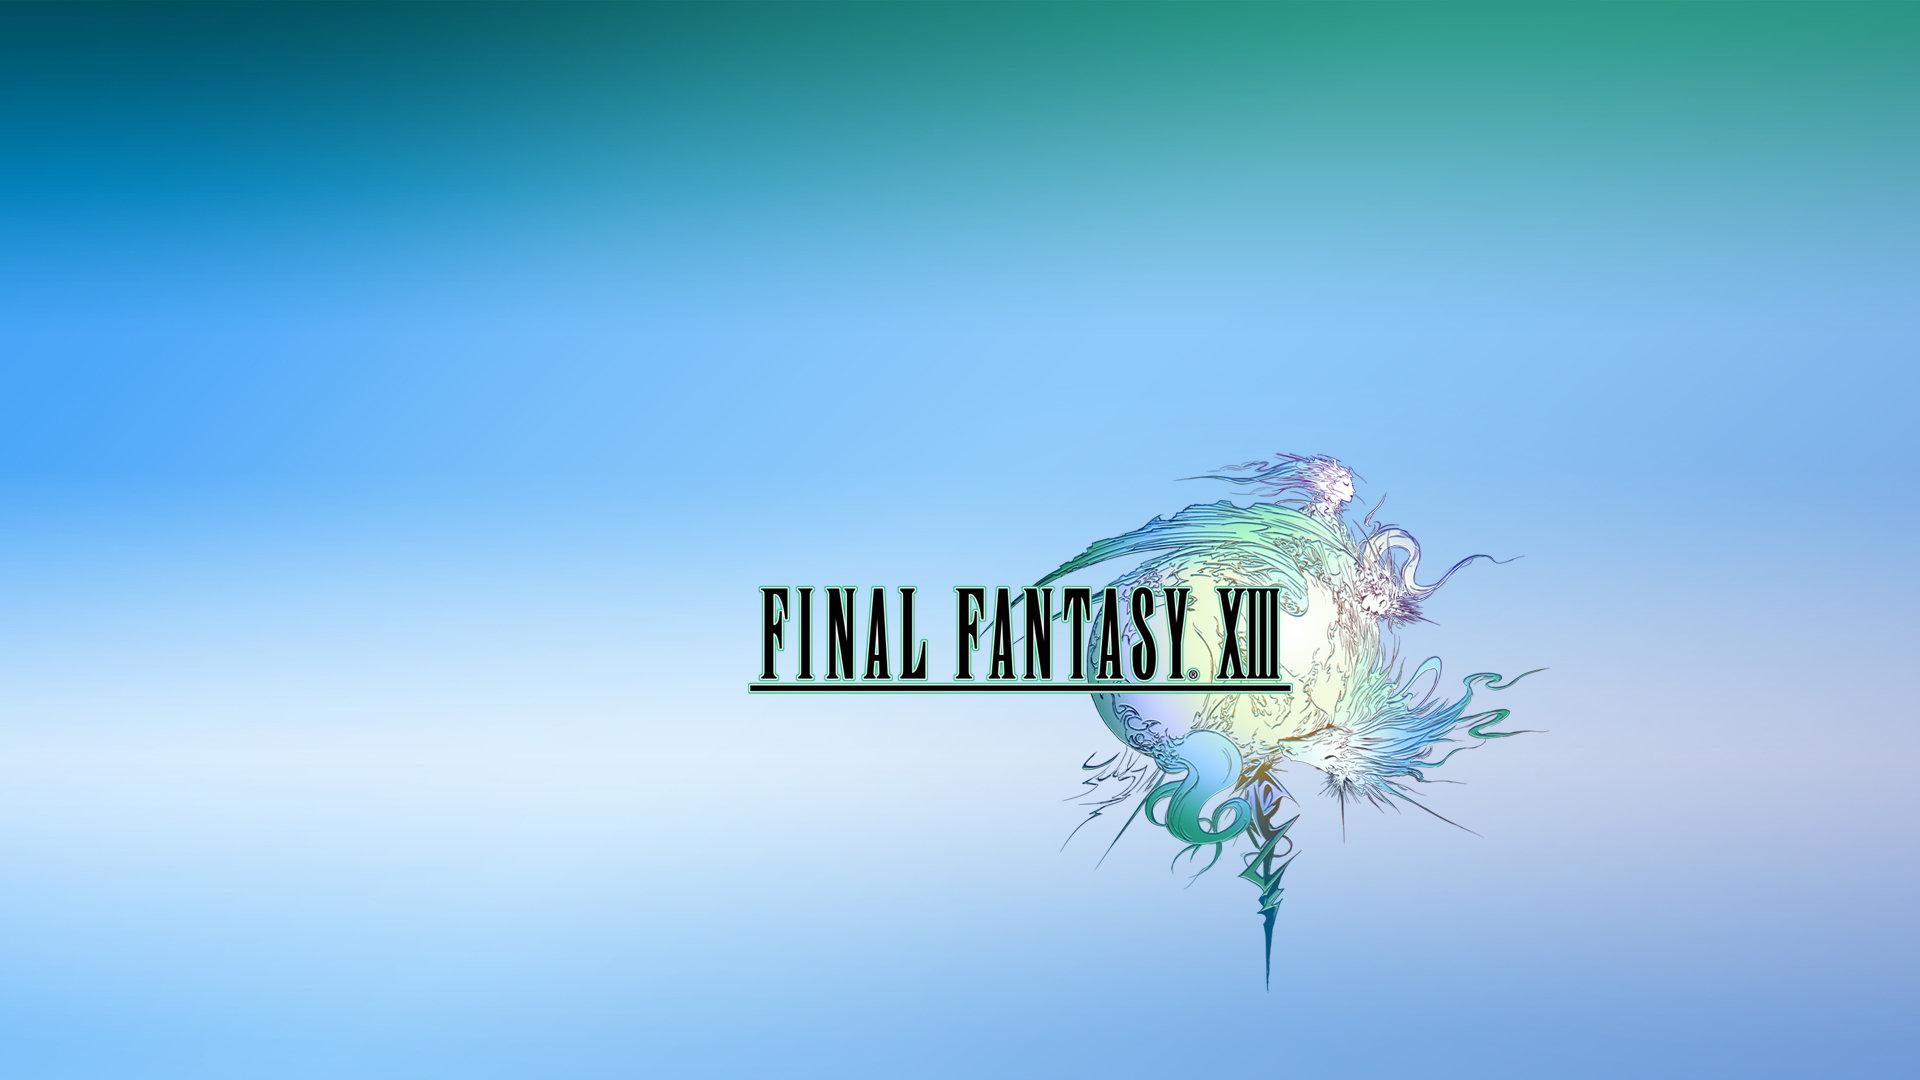 Final Fantasy Xiii Ff13 Wallpapers 1920x1080 Full Hd 1080p